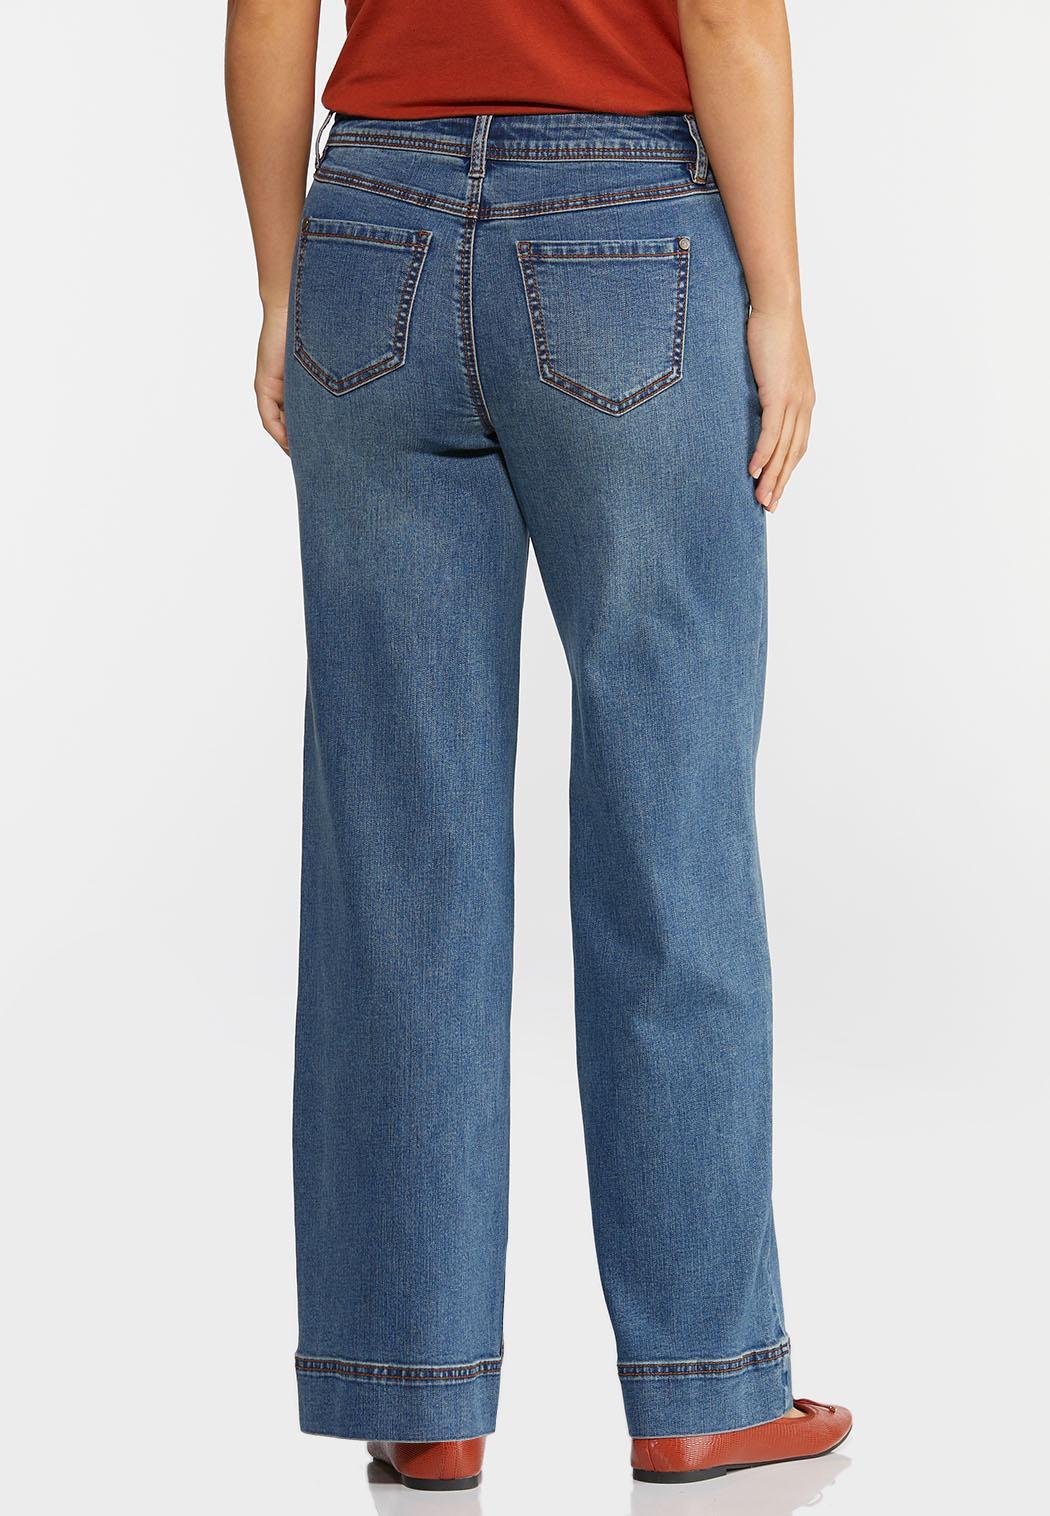 Petite High-Rise Wide Leg Jeans (Item #44400182)